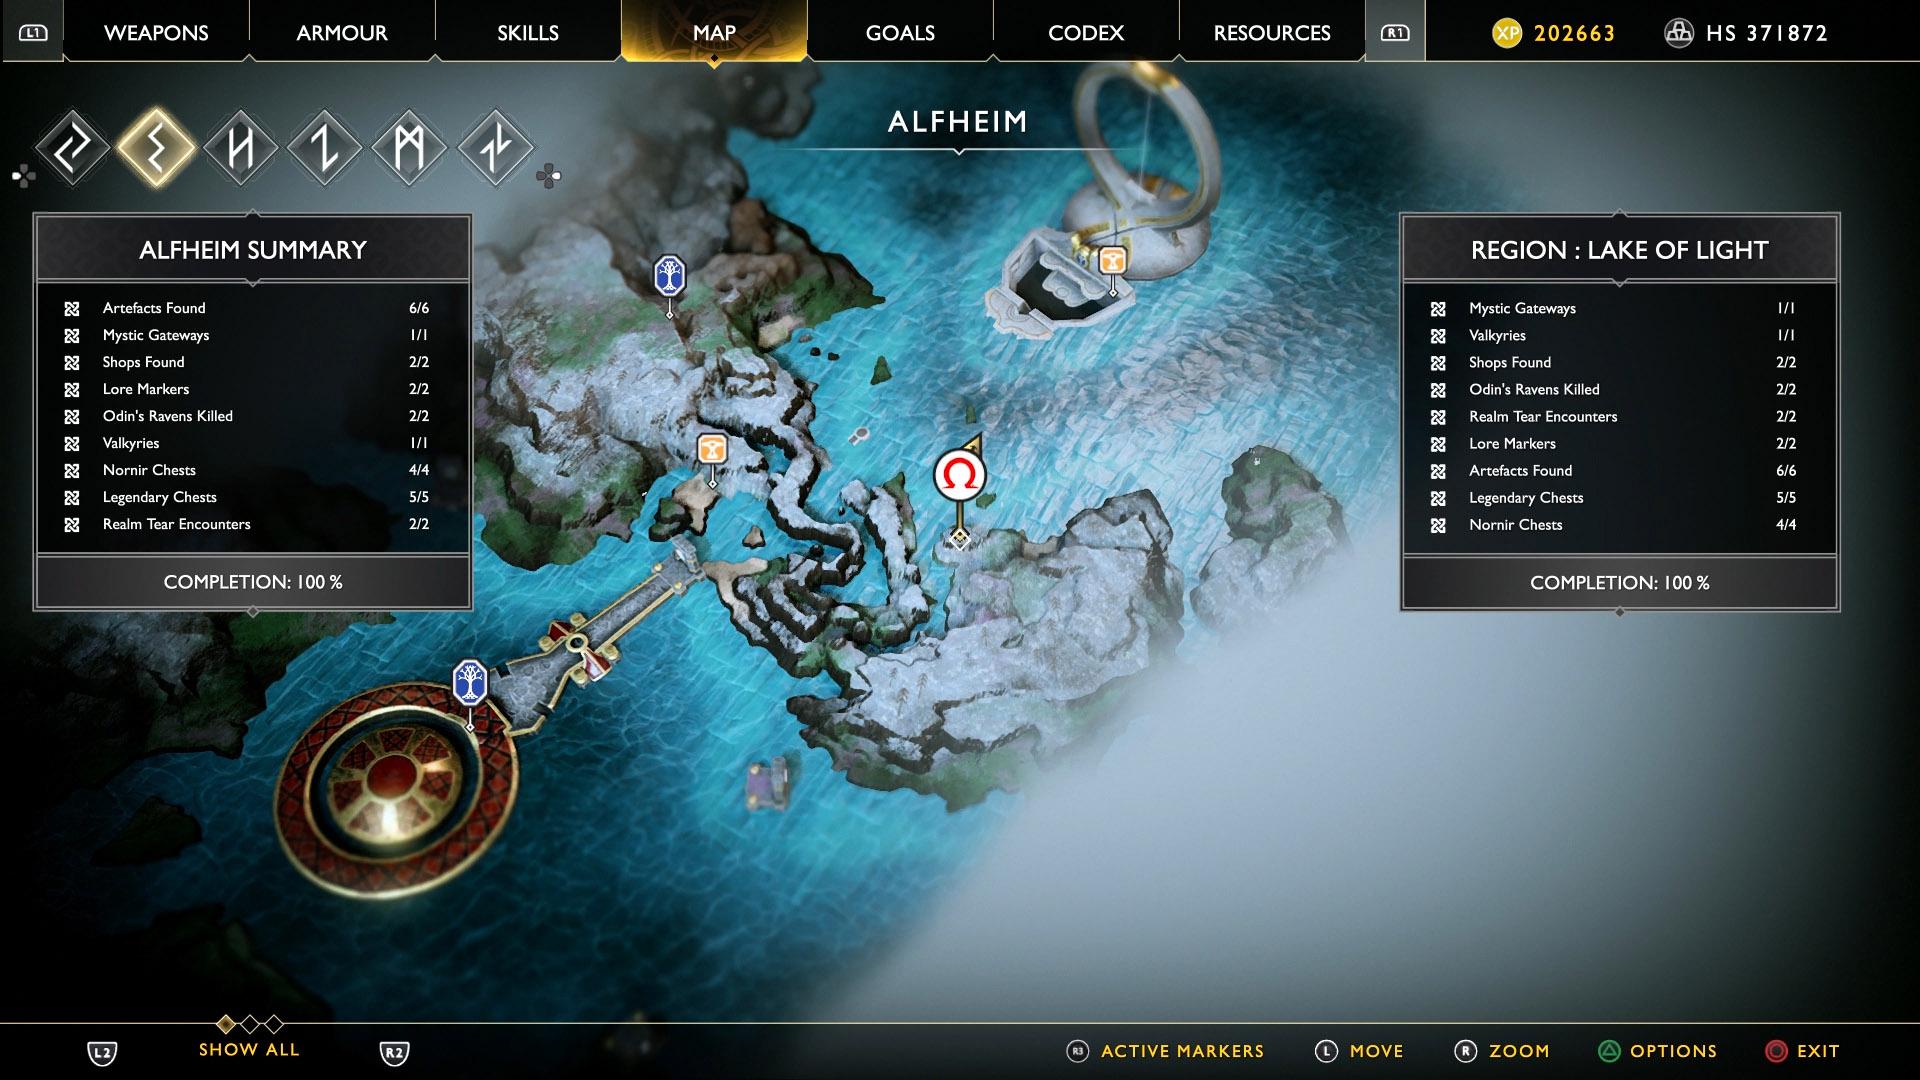 All Realm Tear Locations in God of War | Shacknews